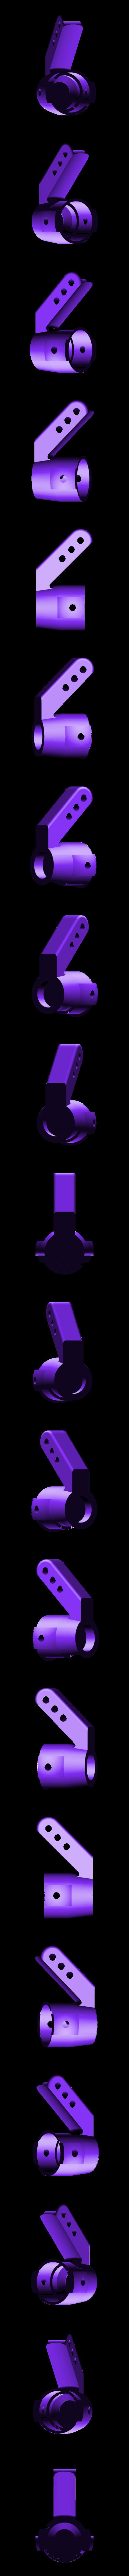 MRCC_OBTS_SUS_FSBLOCK_TYPEB_ONROAD.stl Download STL file MyRCCar 1/10 On-Road Build for Tesla Model S Body RC Car • 3D print object, dlb5